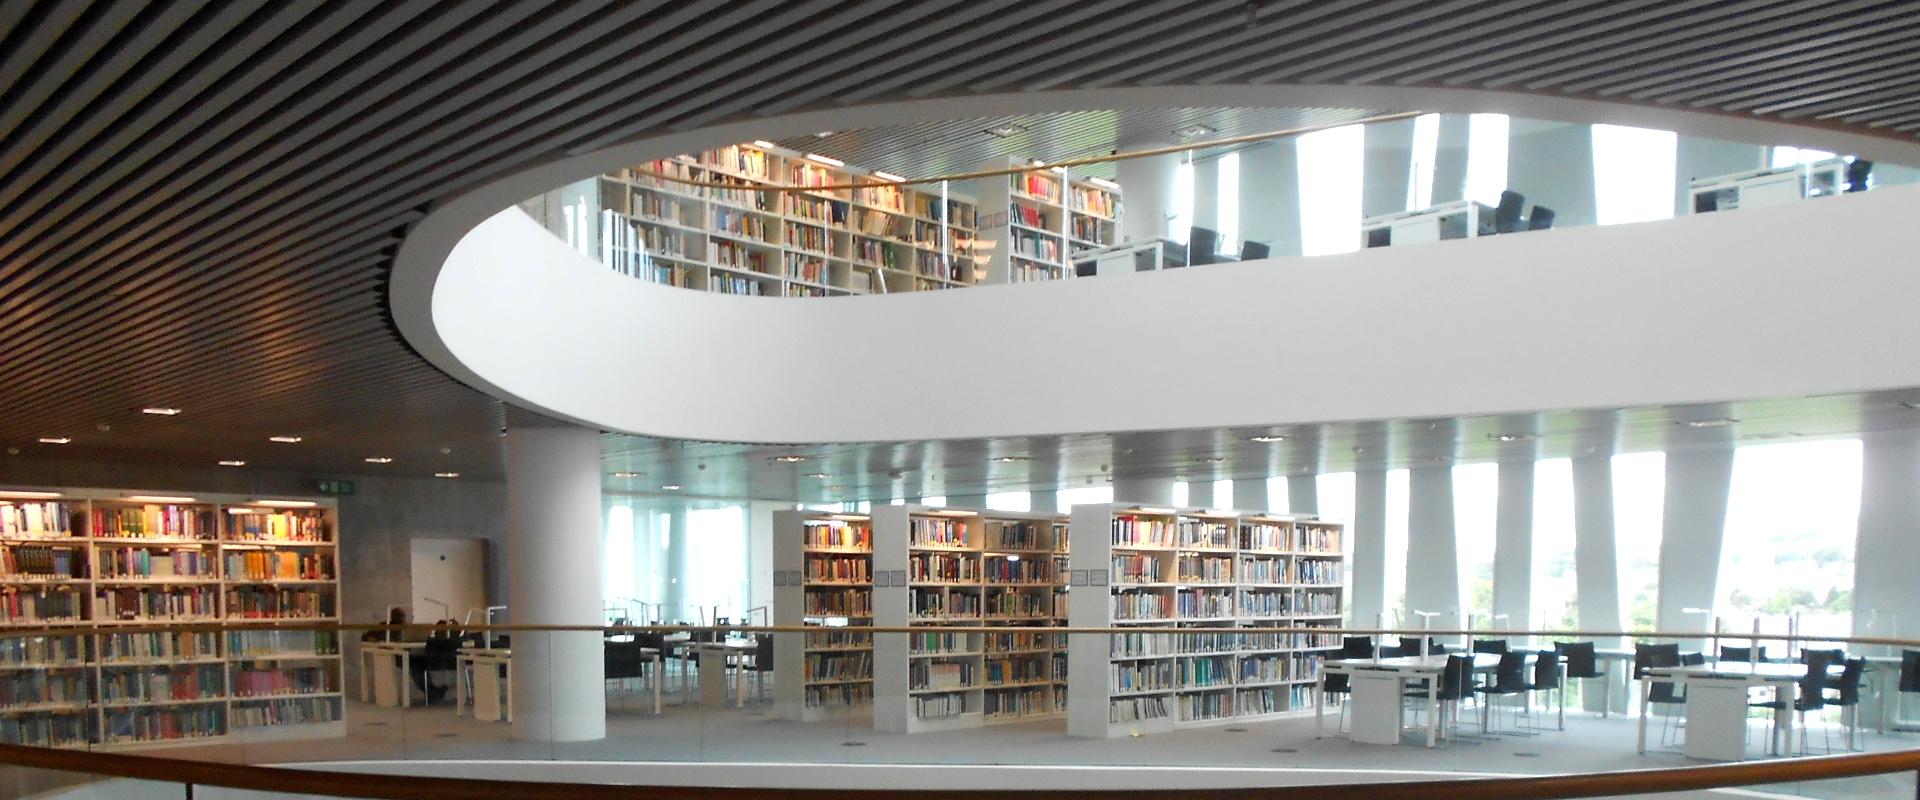 University of Aberdeen, Scotland, United Kingdom